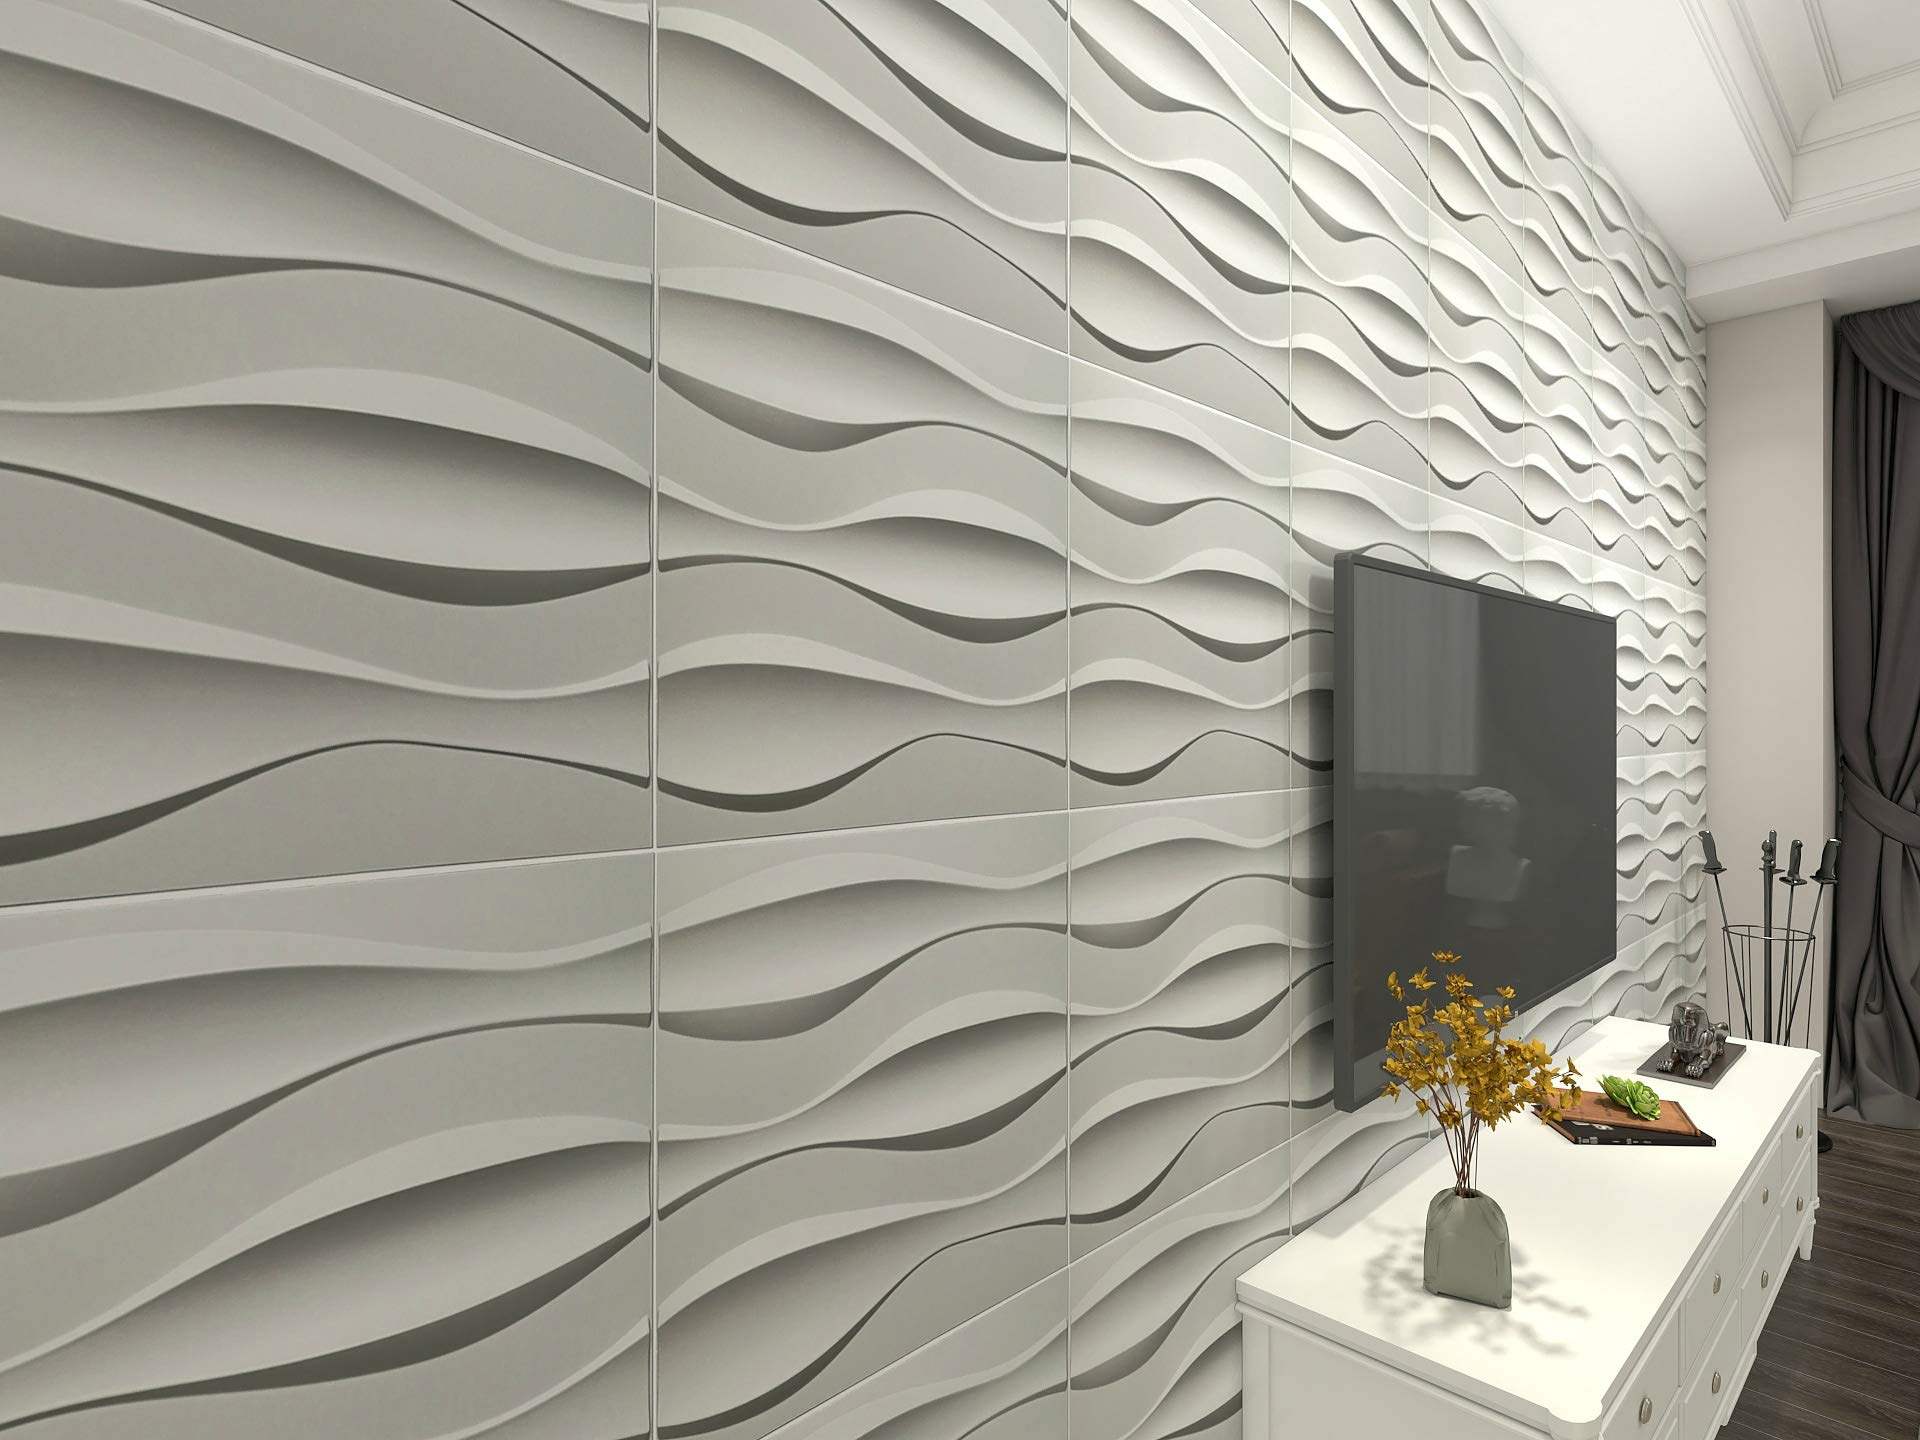 50x50 سنتيمتر البلاستيك القوام الزخرفية ثلاثية الأبعاد لوحات الحائط ، موجة كبيرة لغرفة المعيشة غرفة نوم التلفزيون خلفية السقف حزمة من 12 البلاط